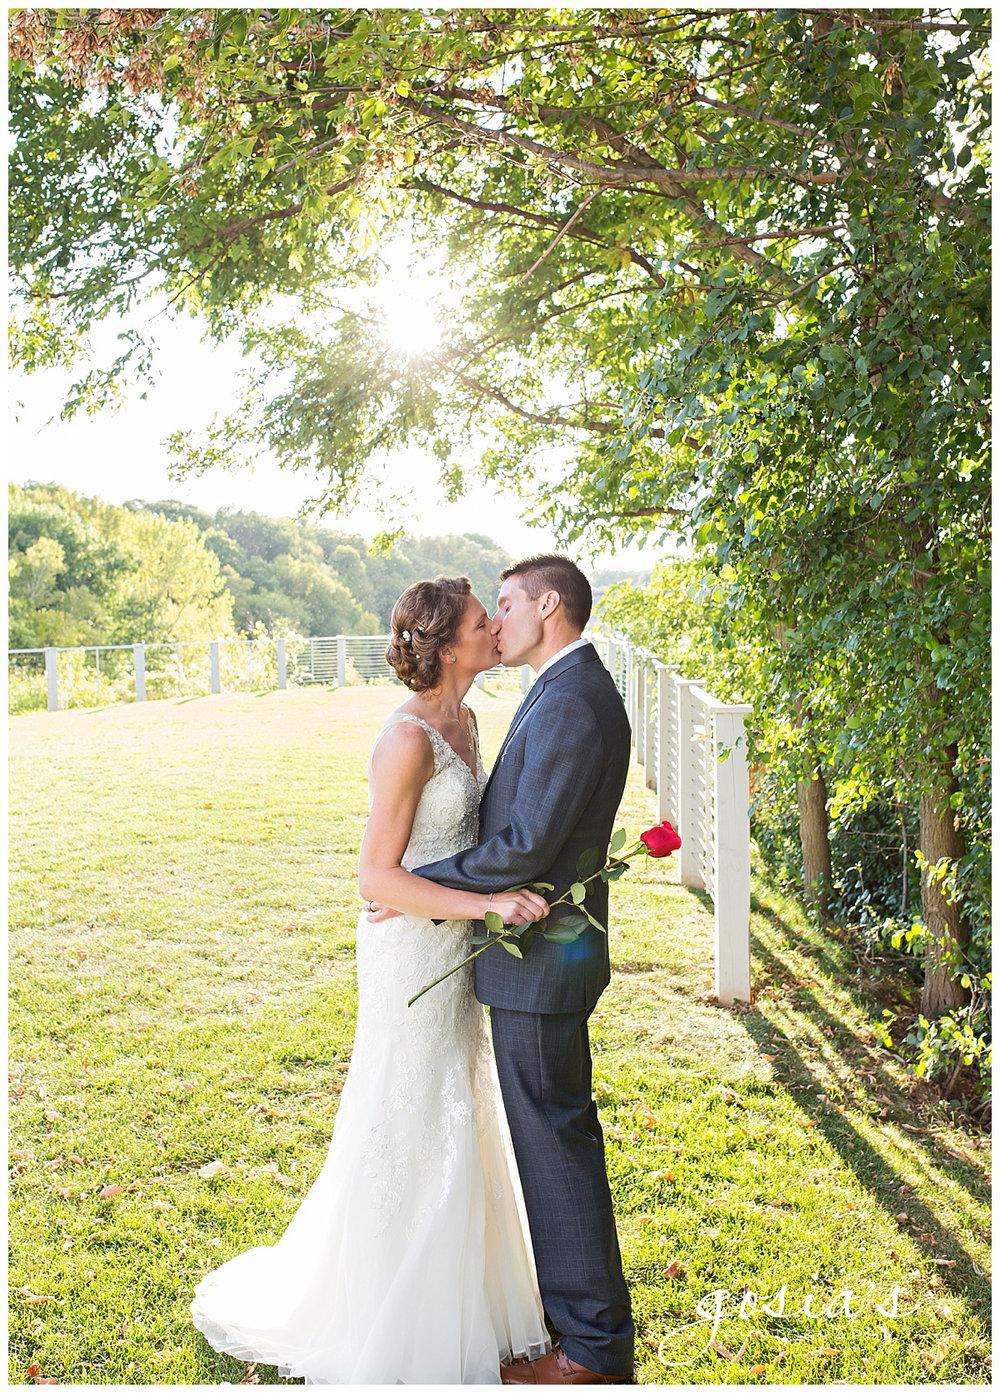 Gosias-Photography-Appleton-wedding-photographer--courthouse-ceremony-reception-Riverview-Gardens-_0030.jpg